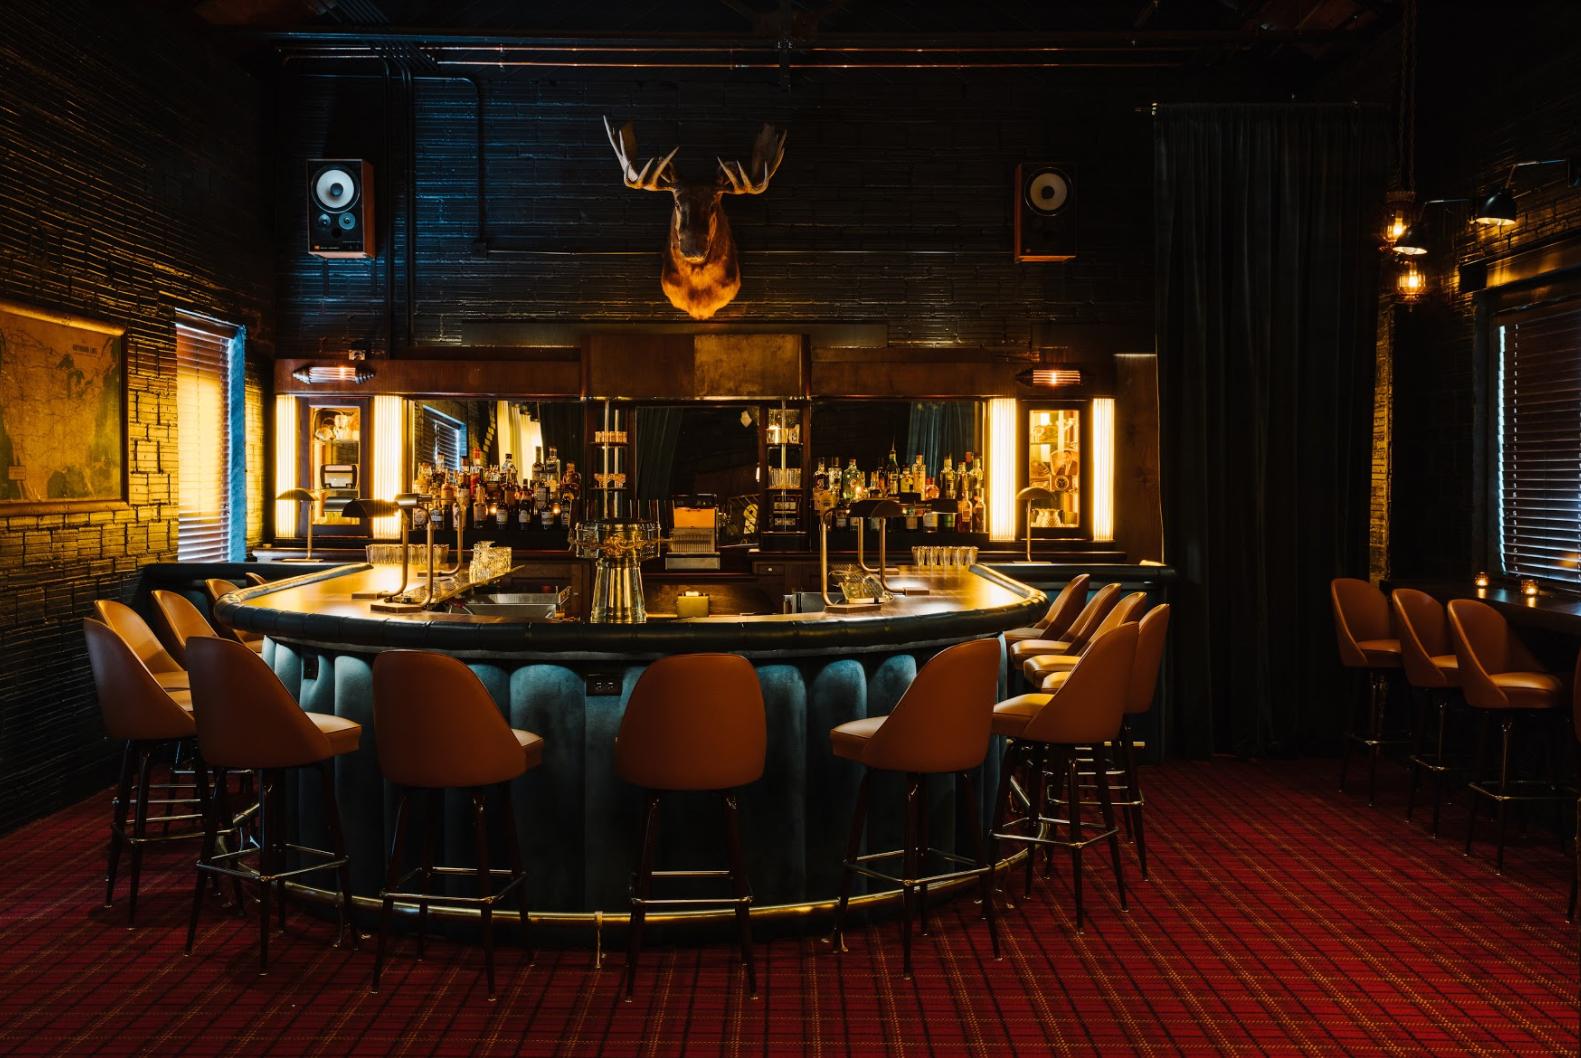 The bar at Golden Eagle.